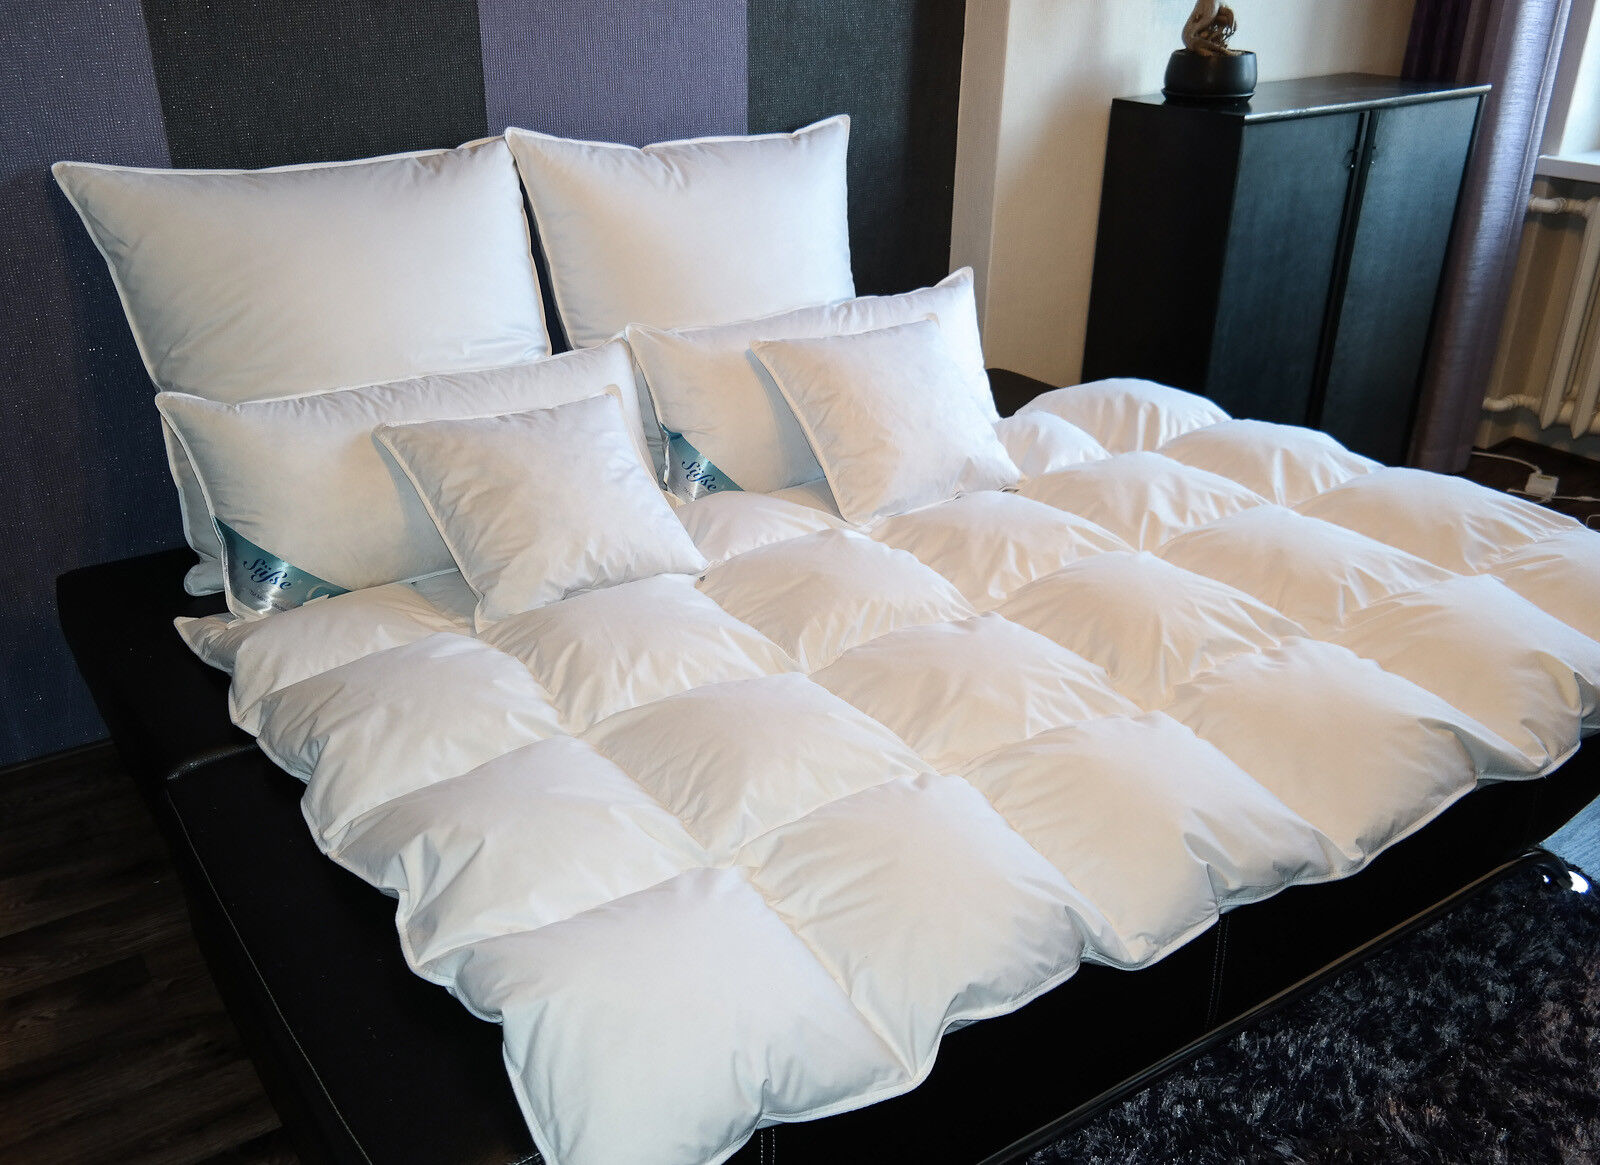 Decke Bettdecke Federdecke Daunendecke  5 Größen 42 Varianten kein Lebendrupf